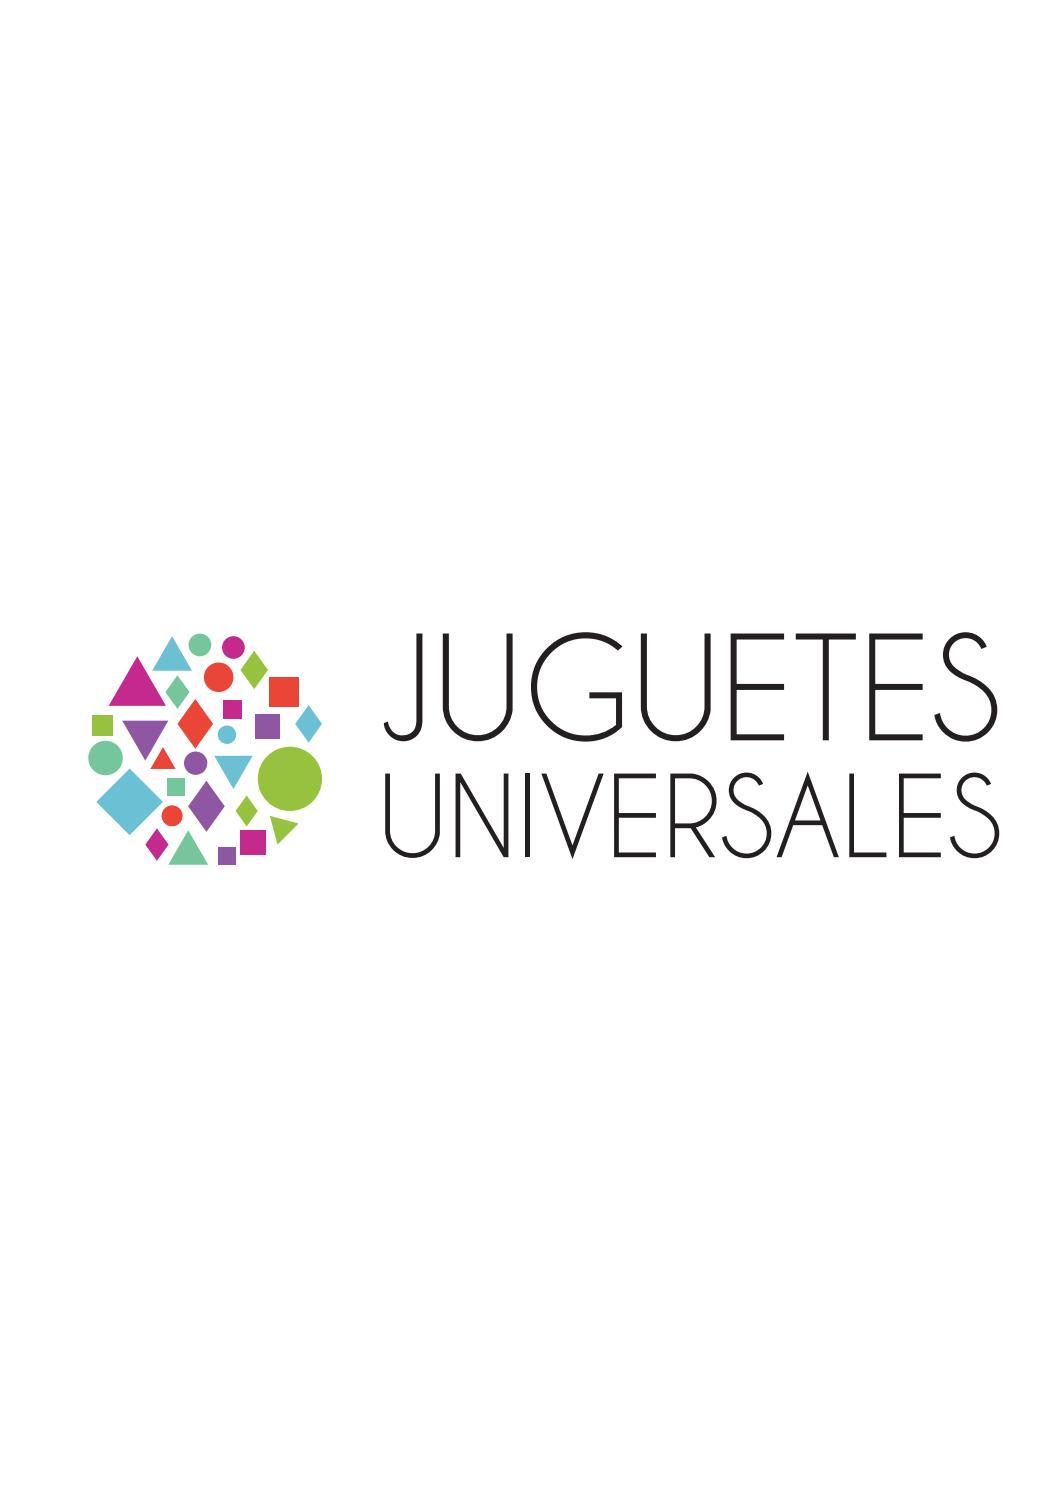 Catálogo 2016 Juguetes Universales by Juguetes Universales - issuu